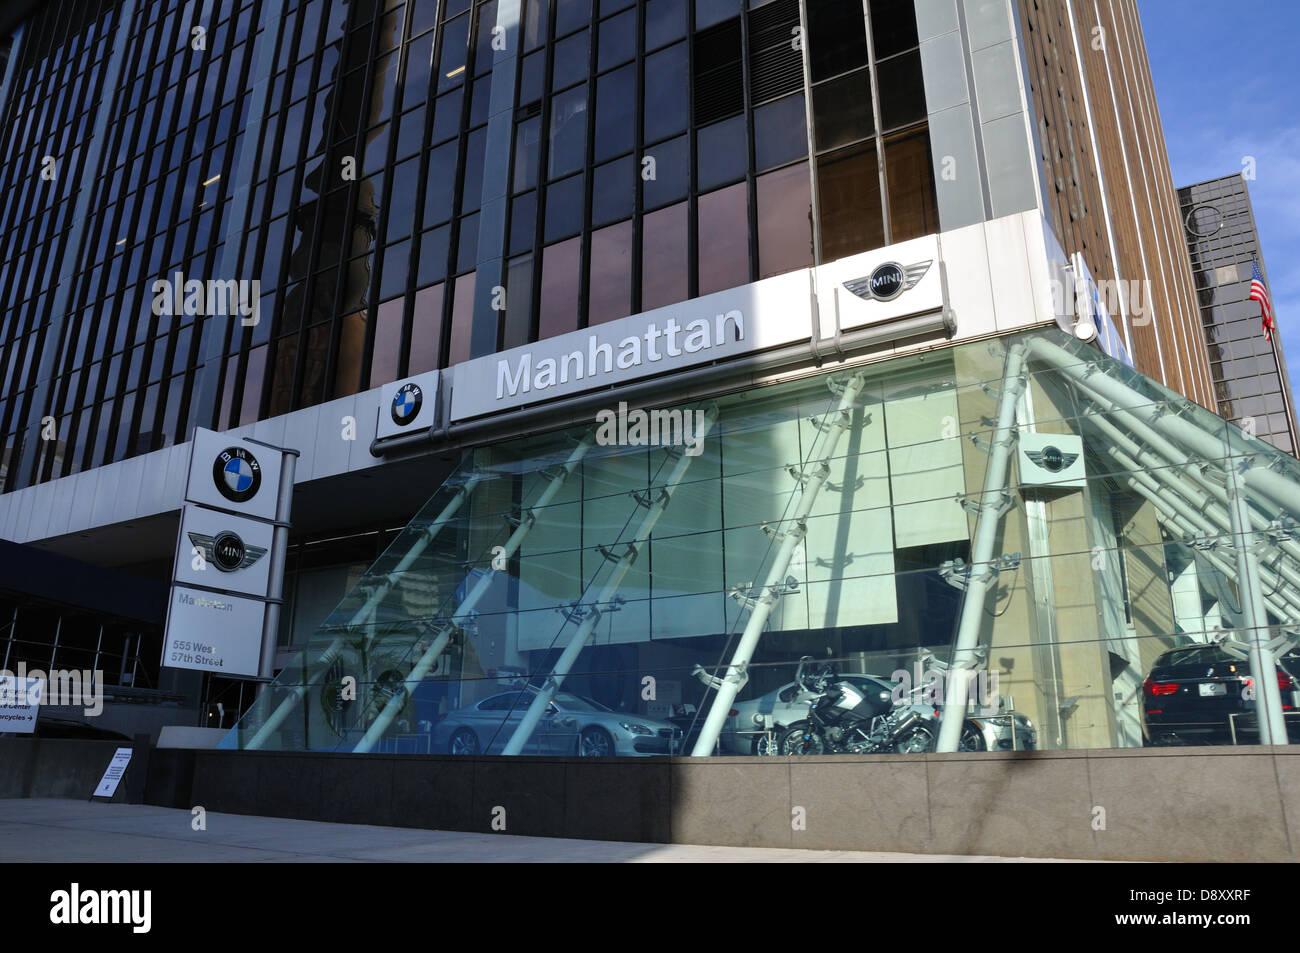 Bmw Car Dealership New York City Usa Stock Photo 57140147 Alamy